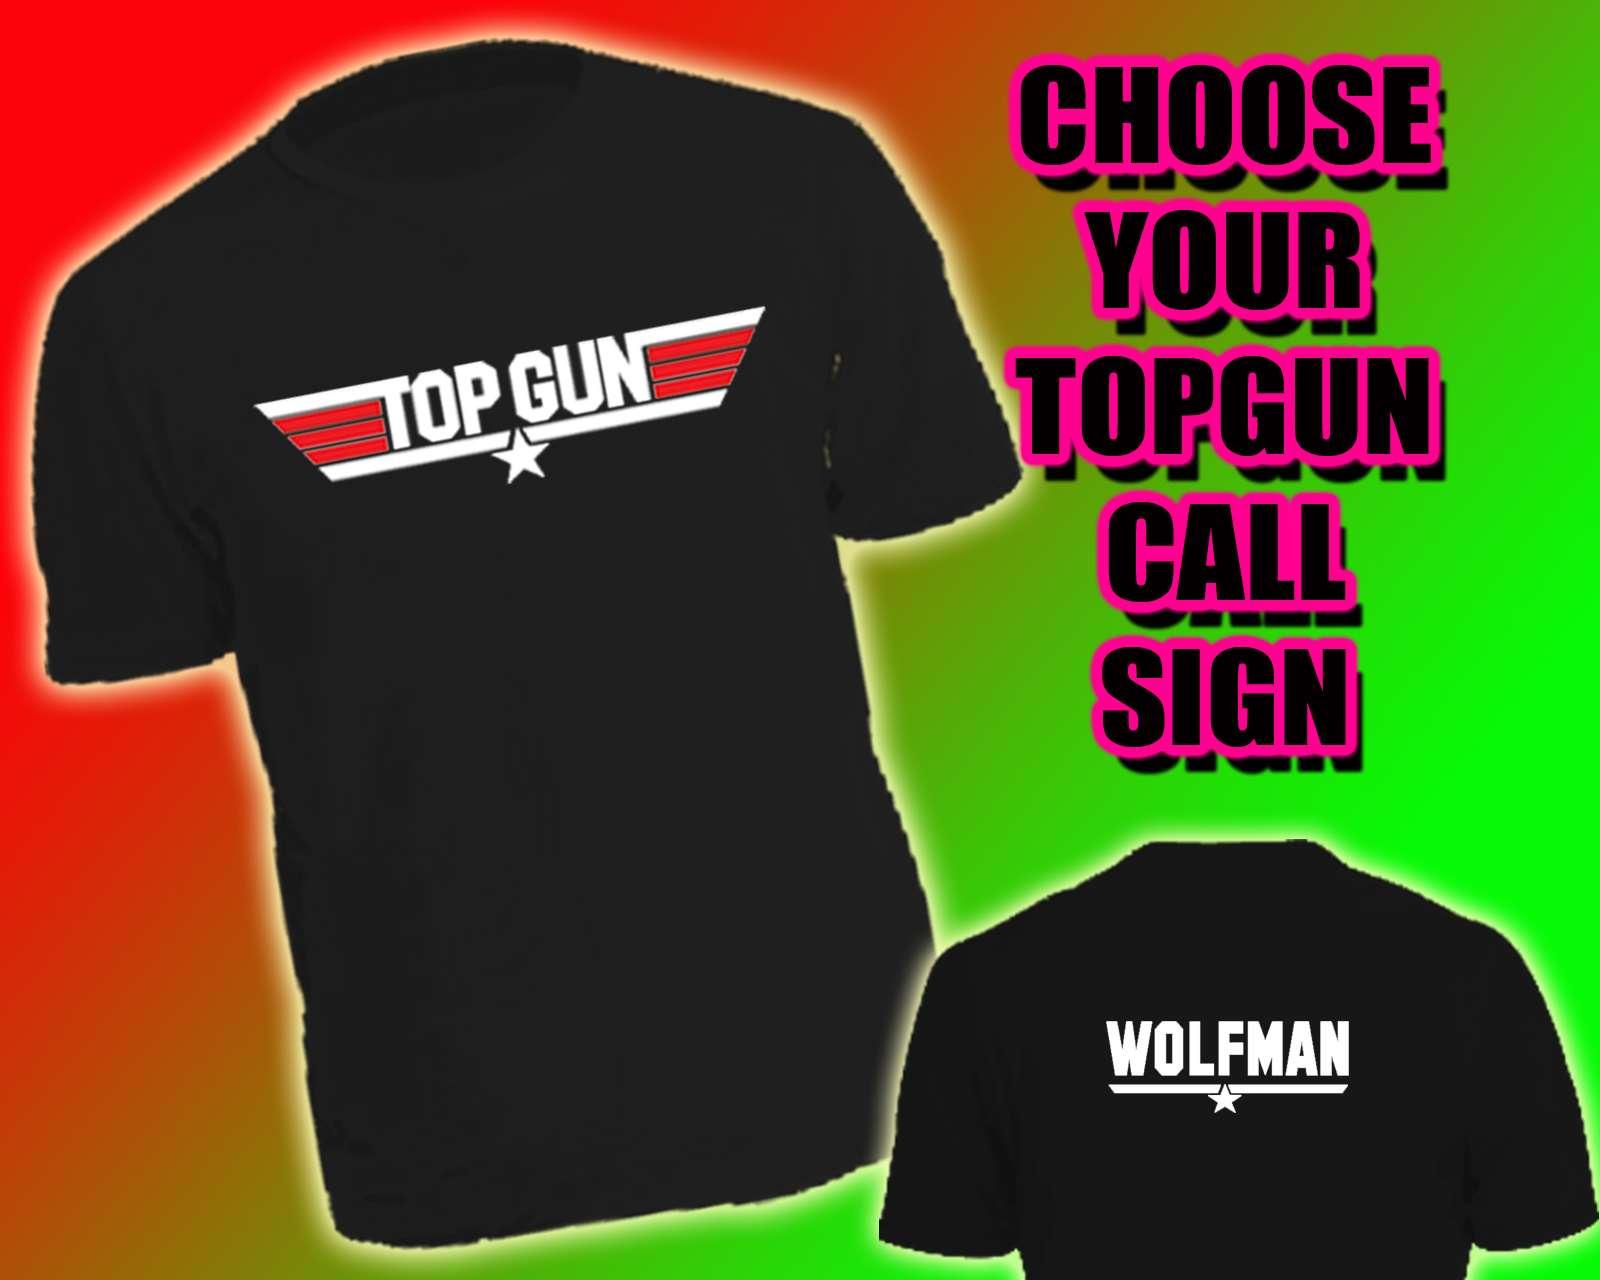 TOP-GUN-T-SHIRT-Stag-Do-Maverick-All-Names-Hollywood-BNWT-topgun-fancy-dress